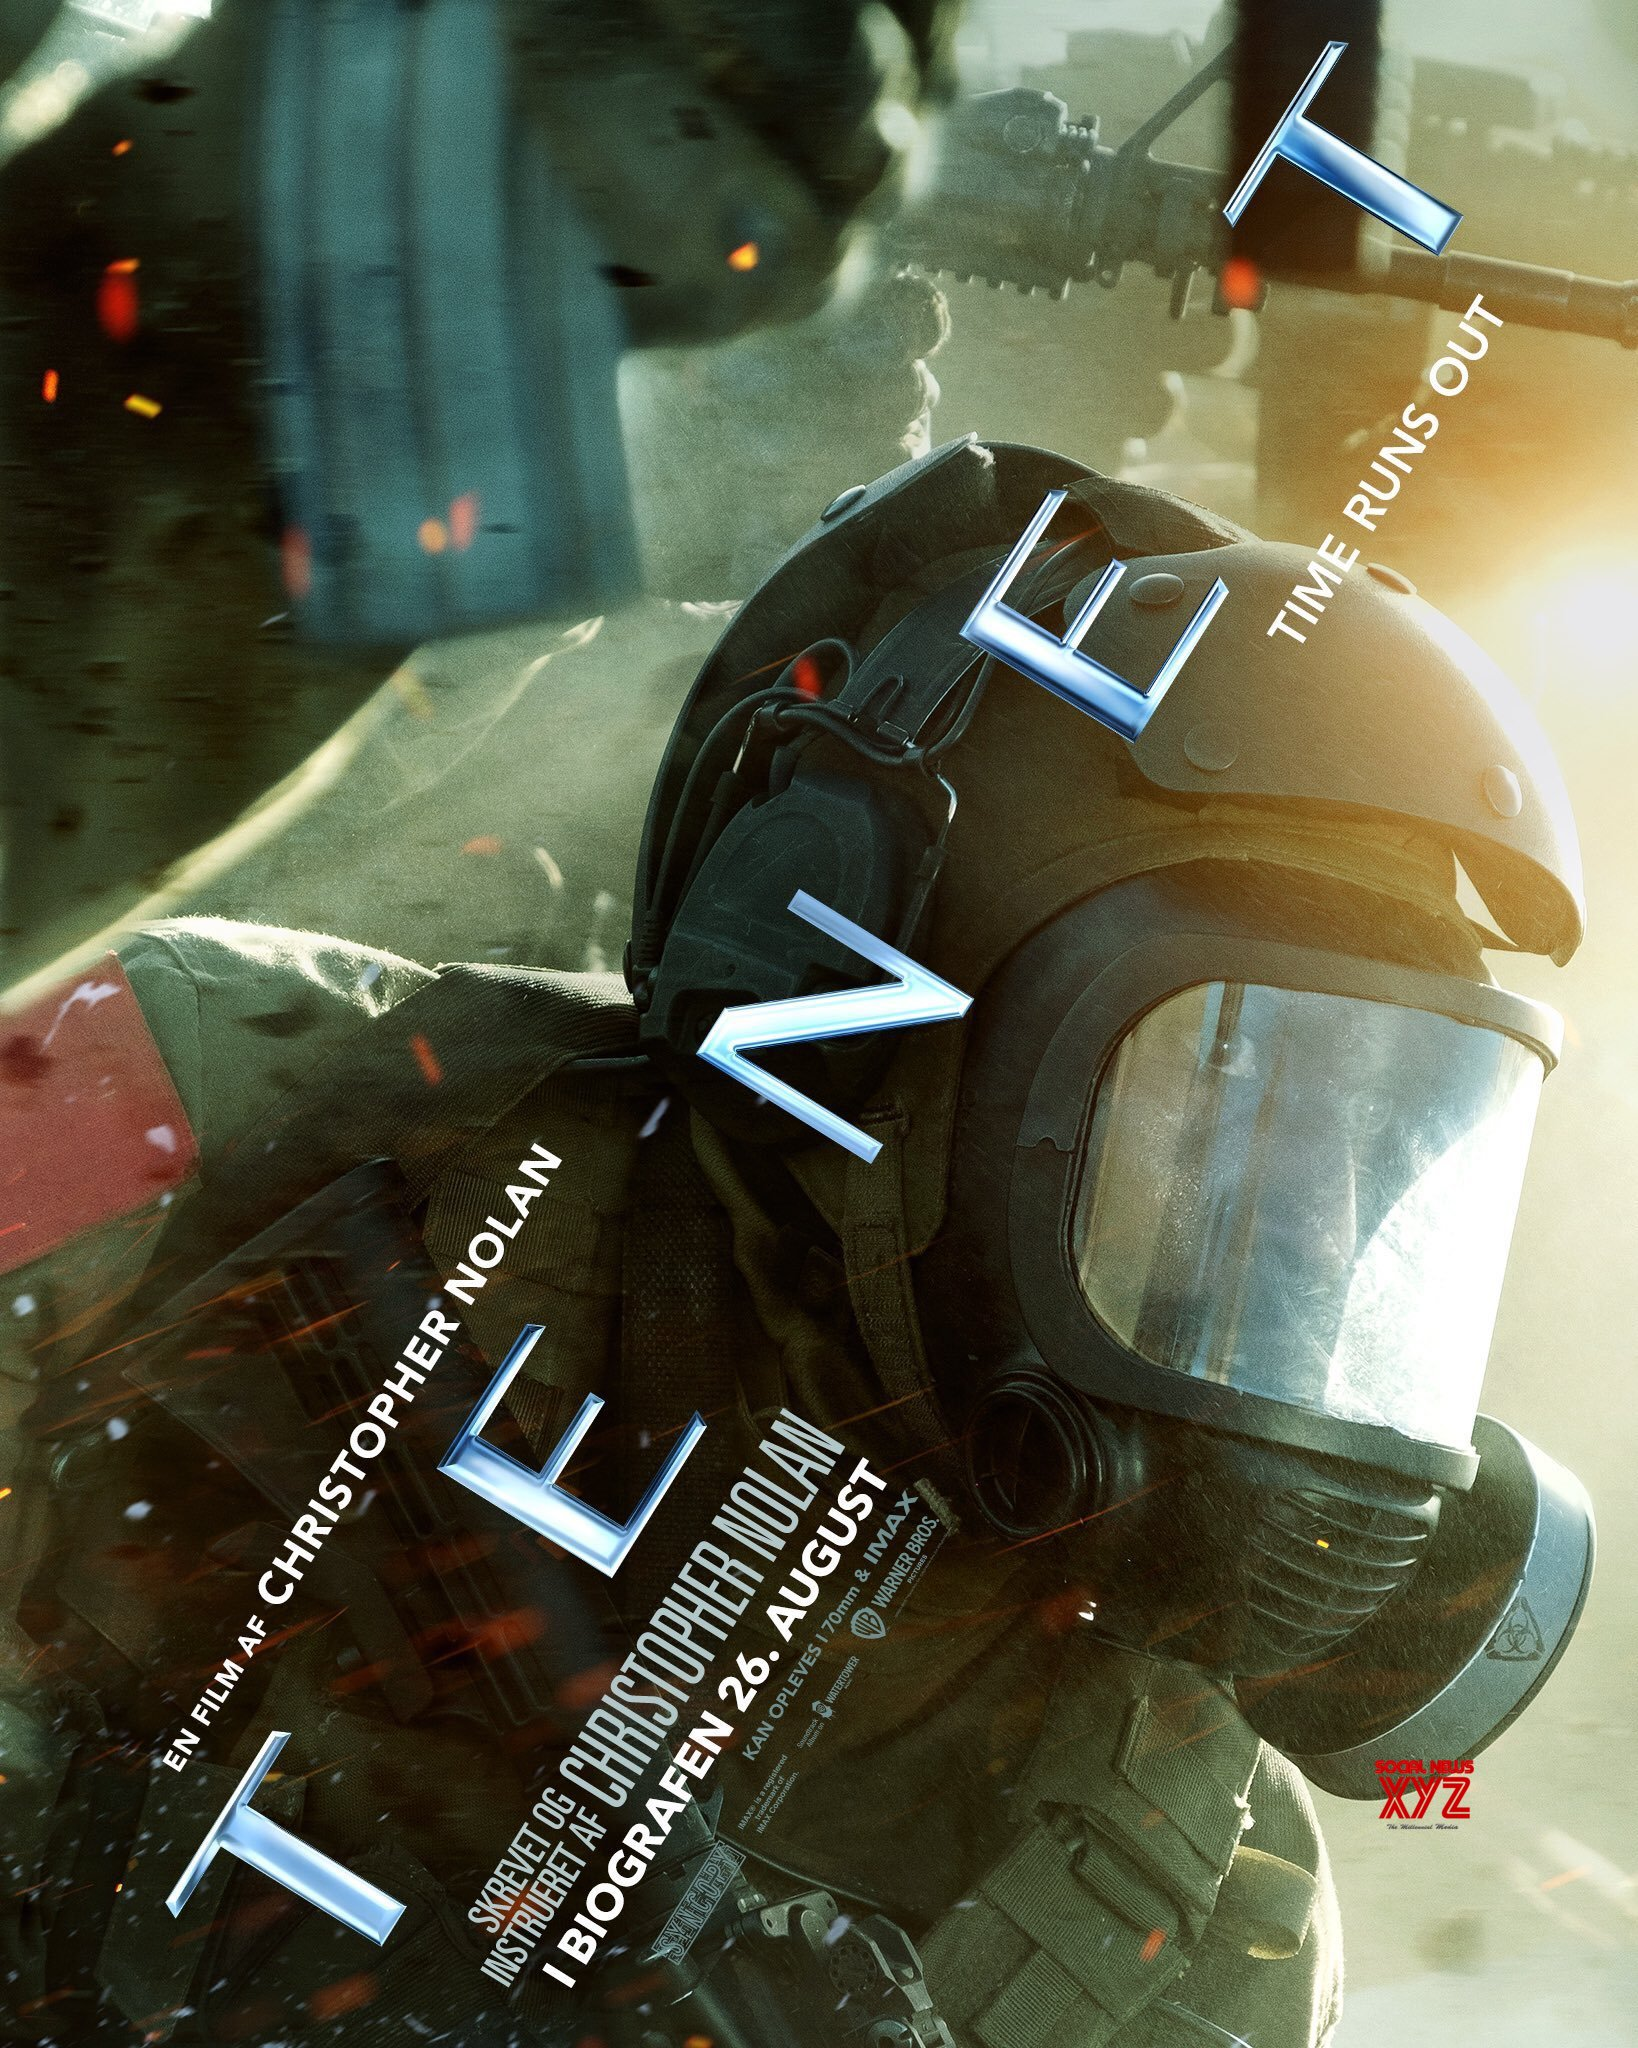 Christopher Nolan's TENET Movie Latest Posters